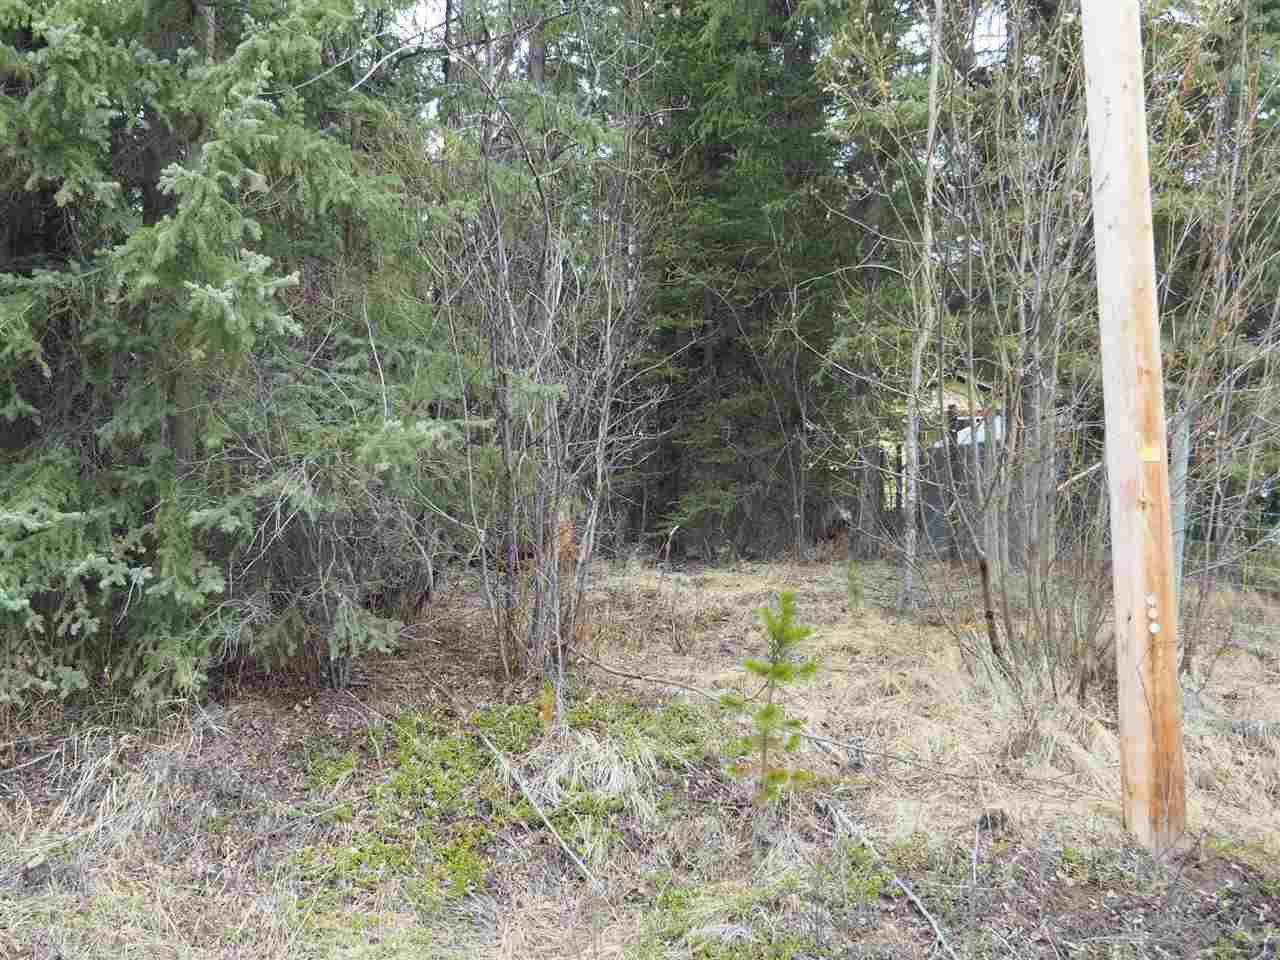 Photo 5: Photos: LOT 216 LUDLOM Road: Deka Lake / Sulphurous / Hathaway Lakes Land for sale (100 Mile House (Zone 10))  : MLS®# R2397846